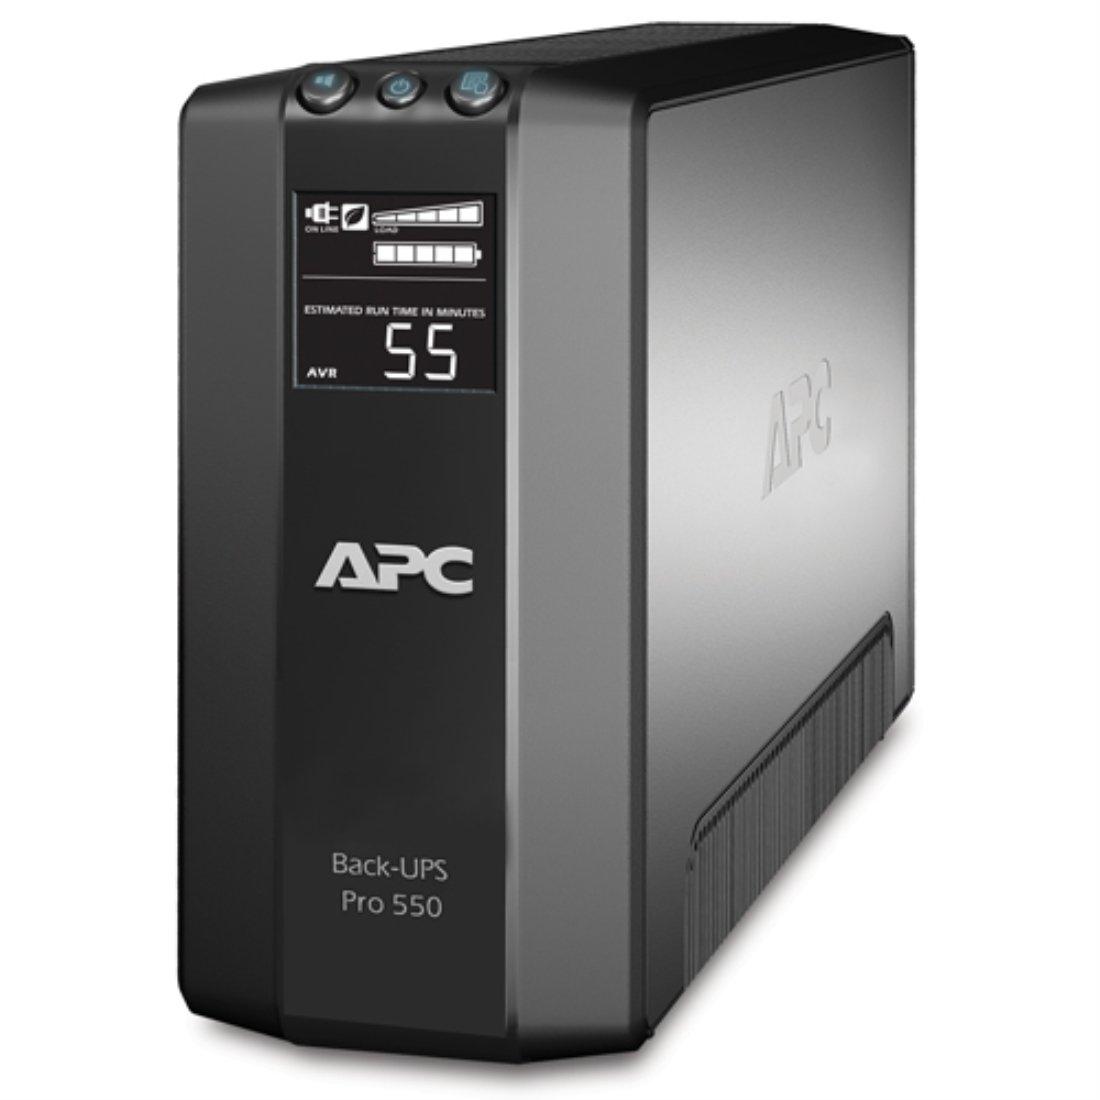 Ondulateur Back-UPS APC BR550GI NOIR 550VA AAC400210044190